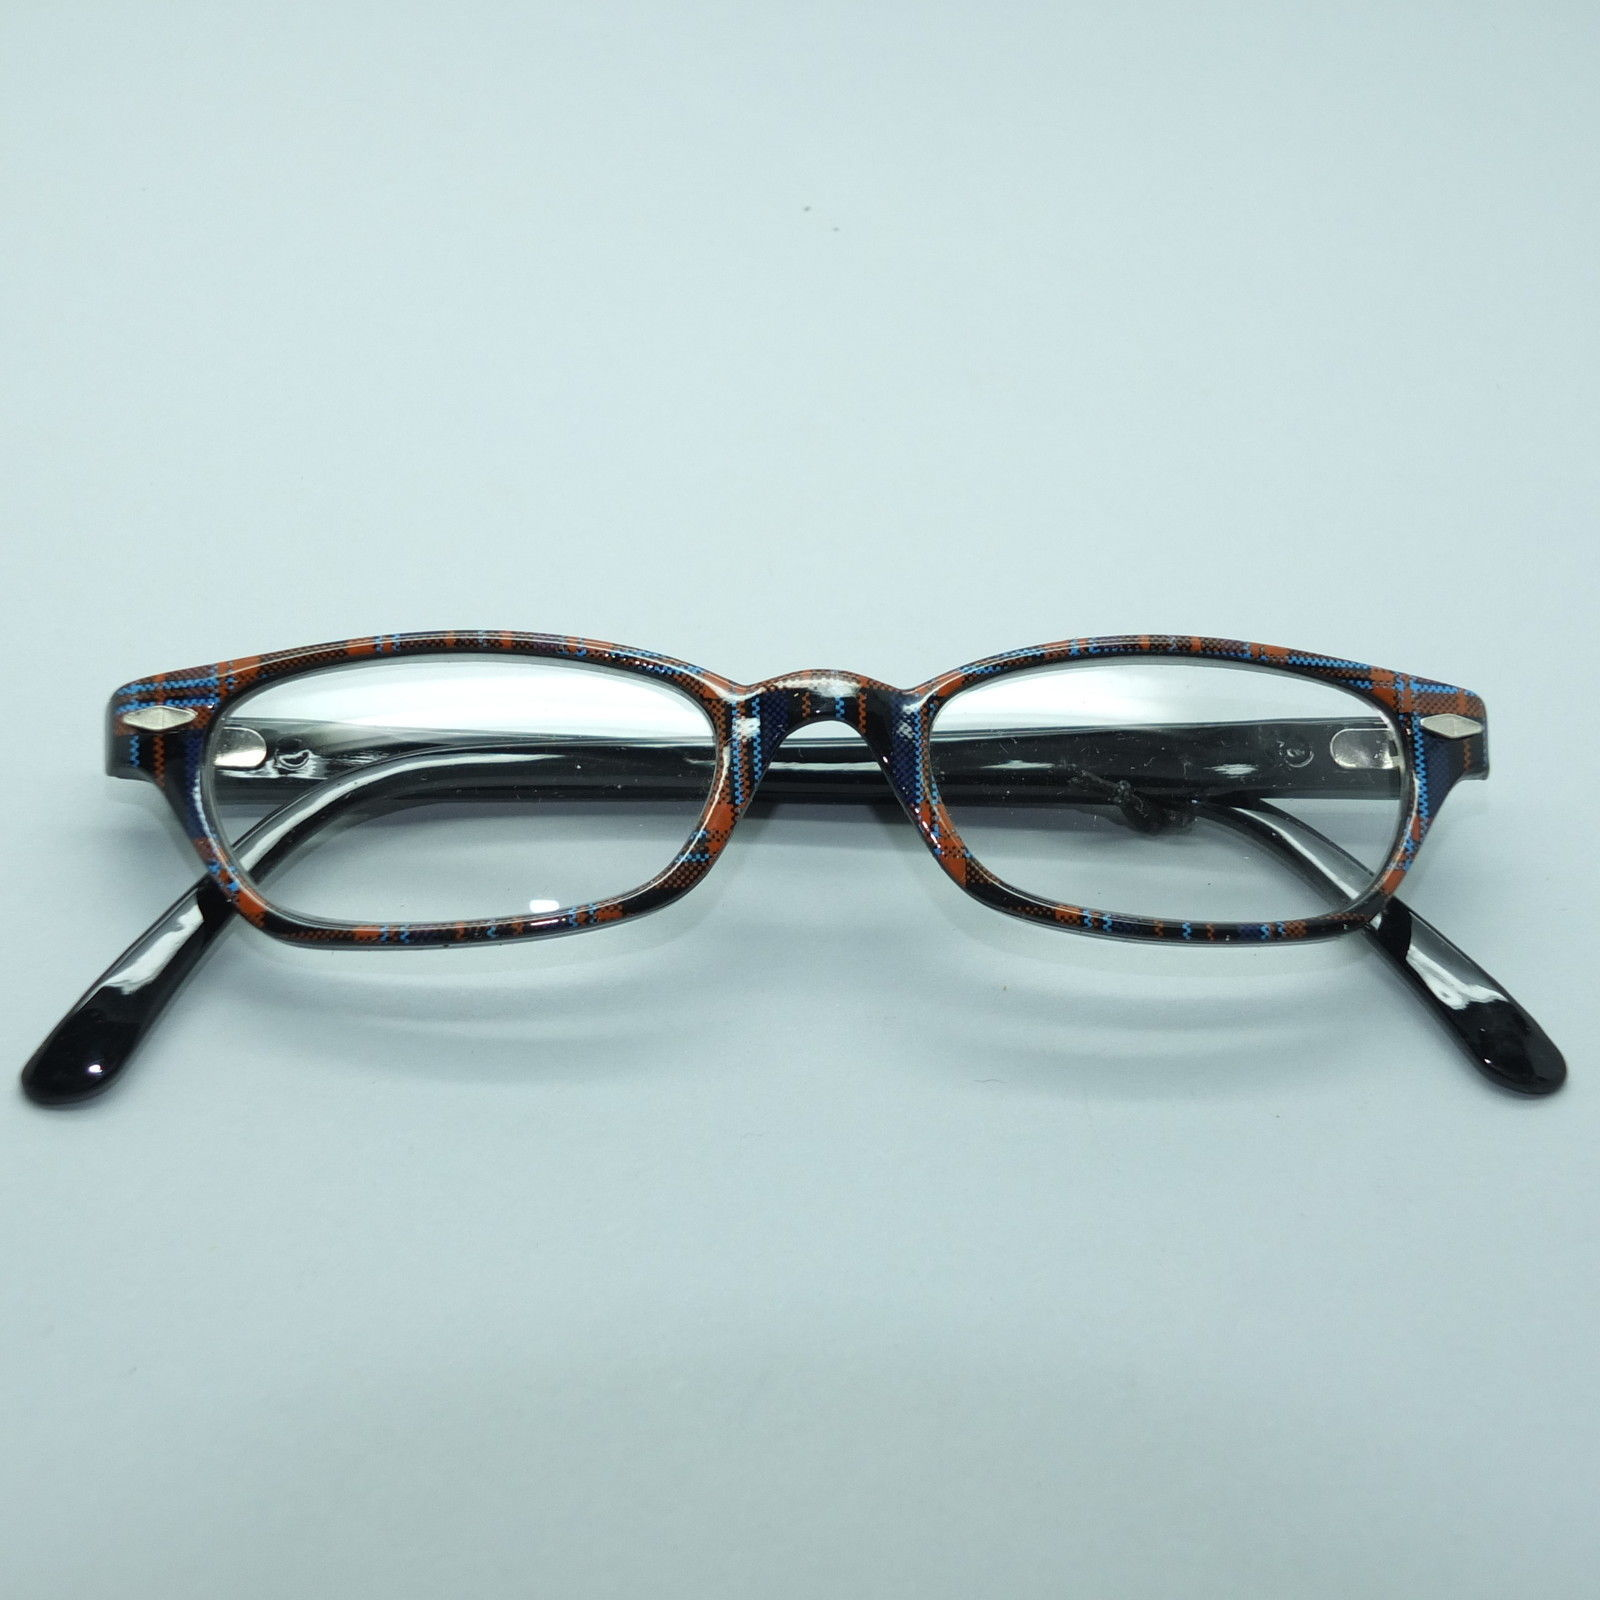 reading glasses plaid check tartan blue and 50 similar